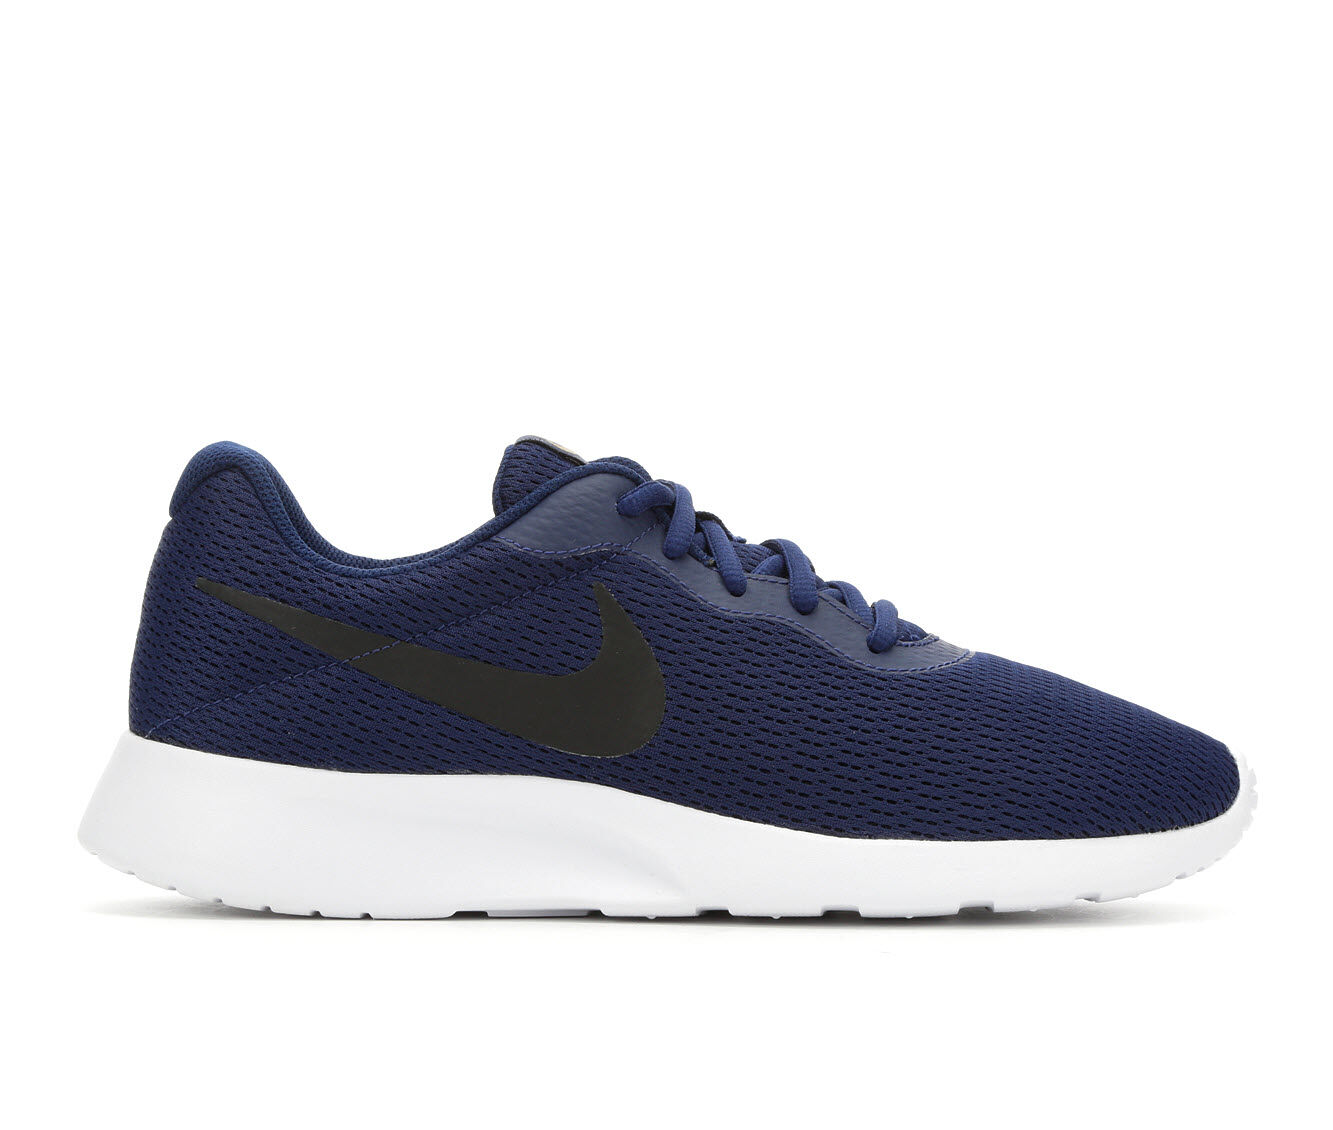 Wholesale Prices Men's Nike Tanjun Sneakers Nvy/Blk/Gld 405